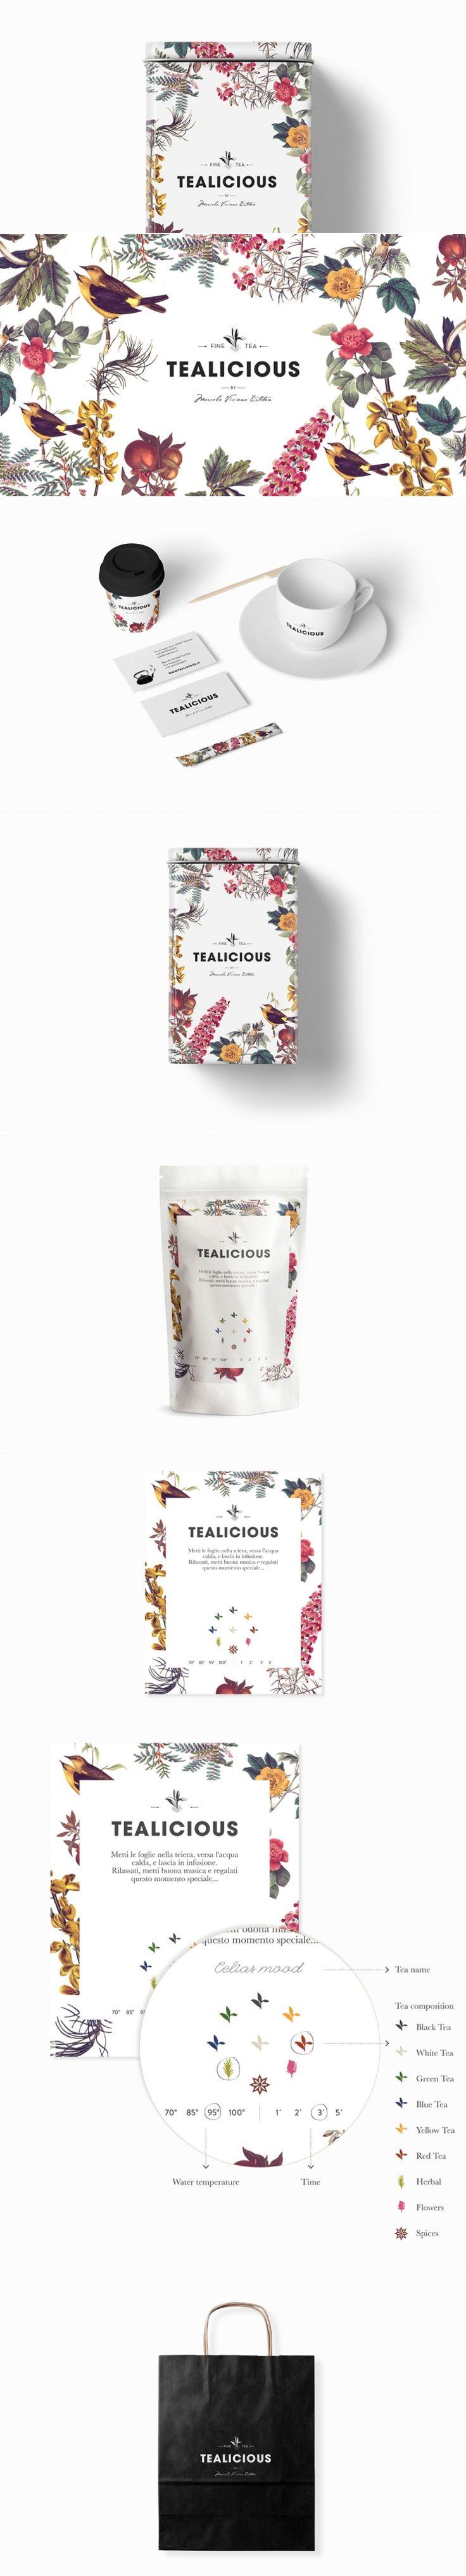 Tealicious — The Dieline | Packaging & Branding Design & Innovation News